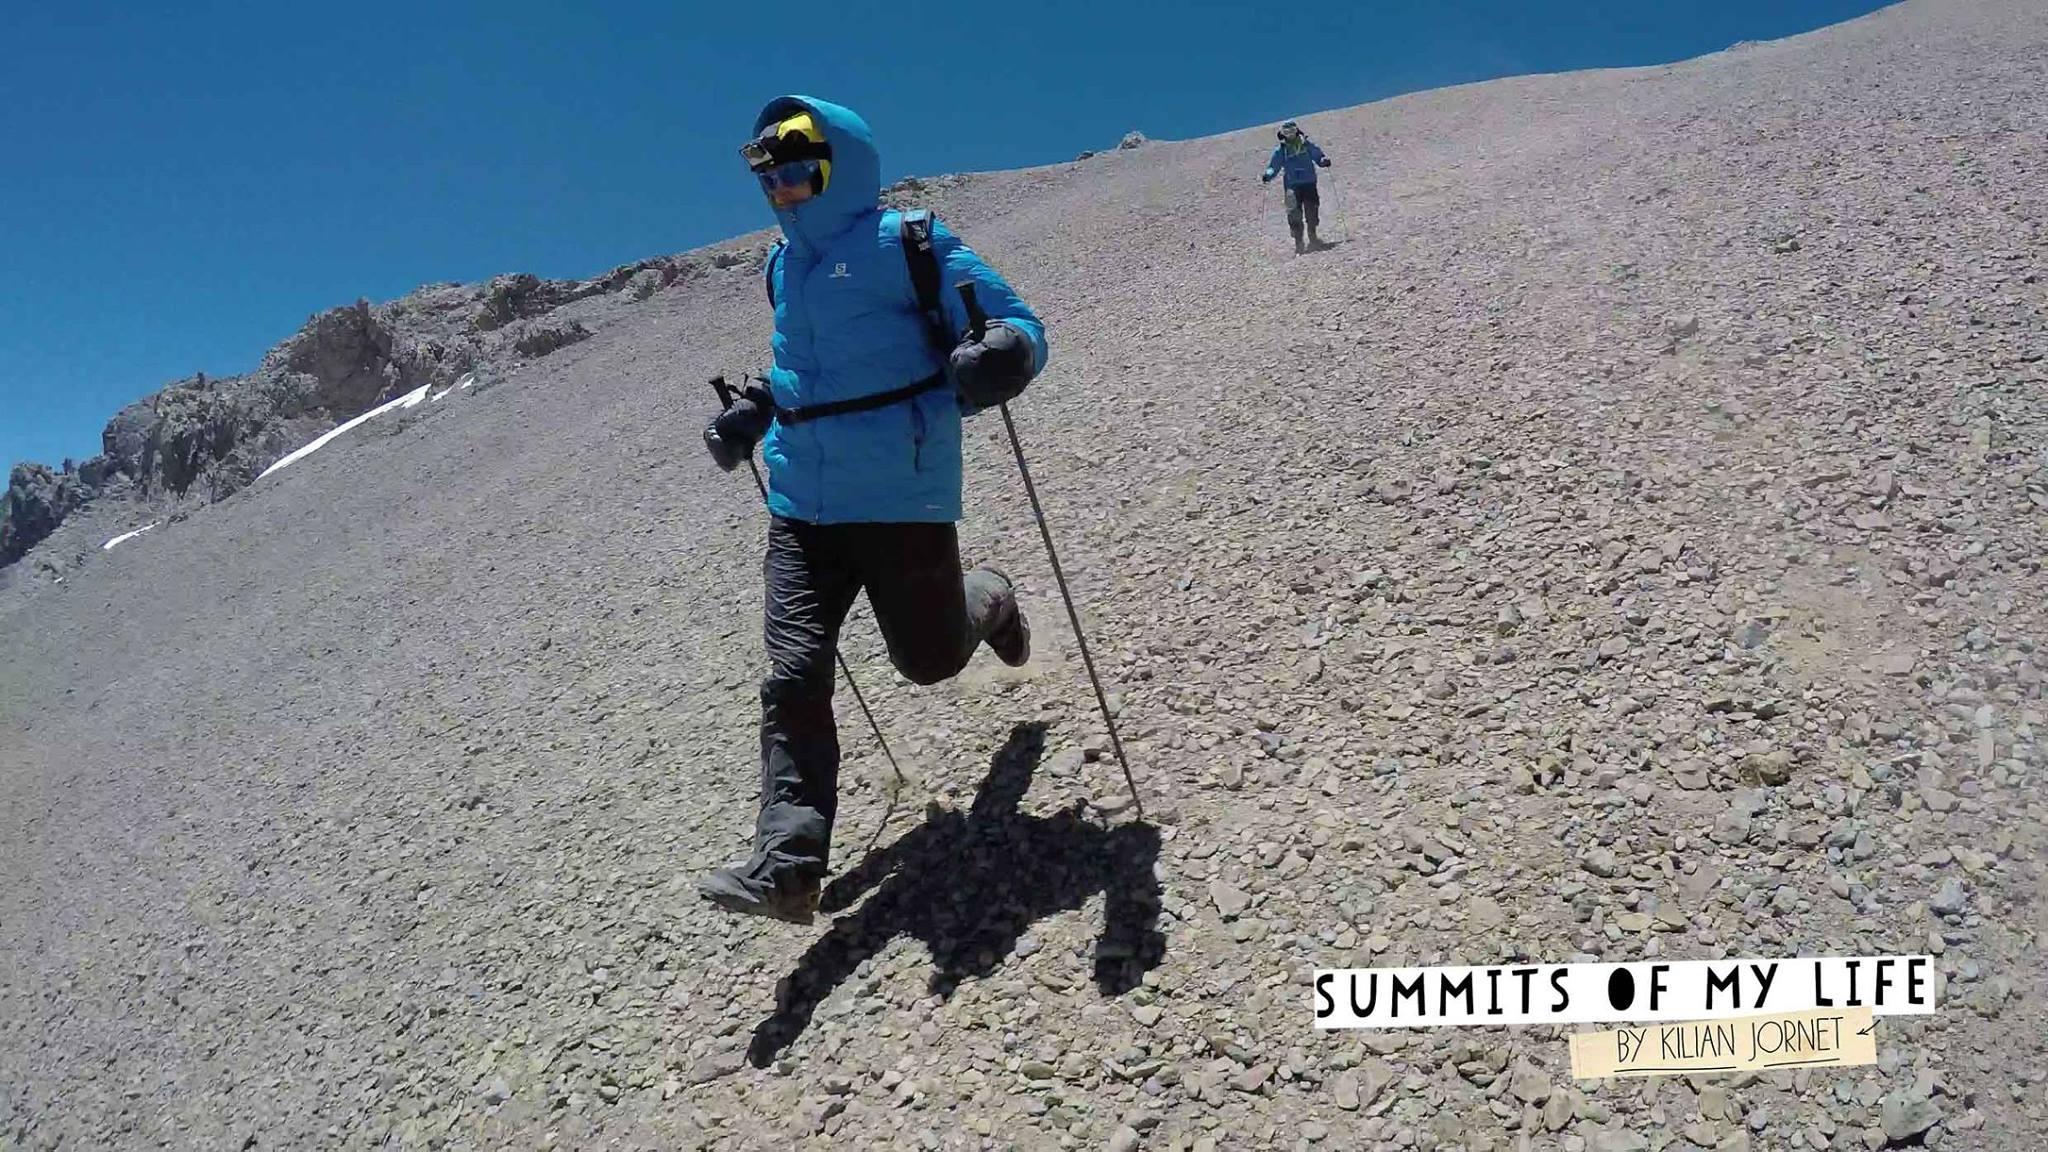 Kilian Jornet en el Aconcagua